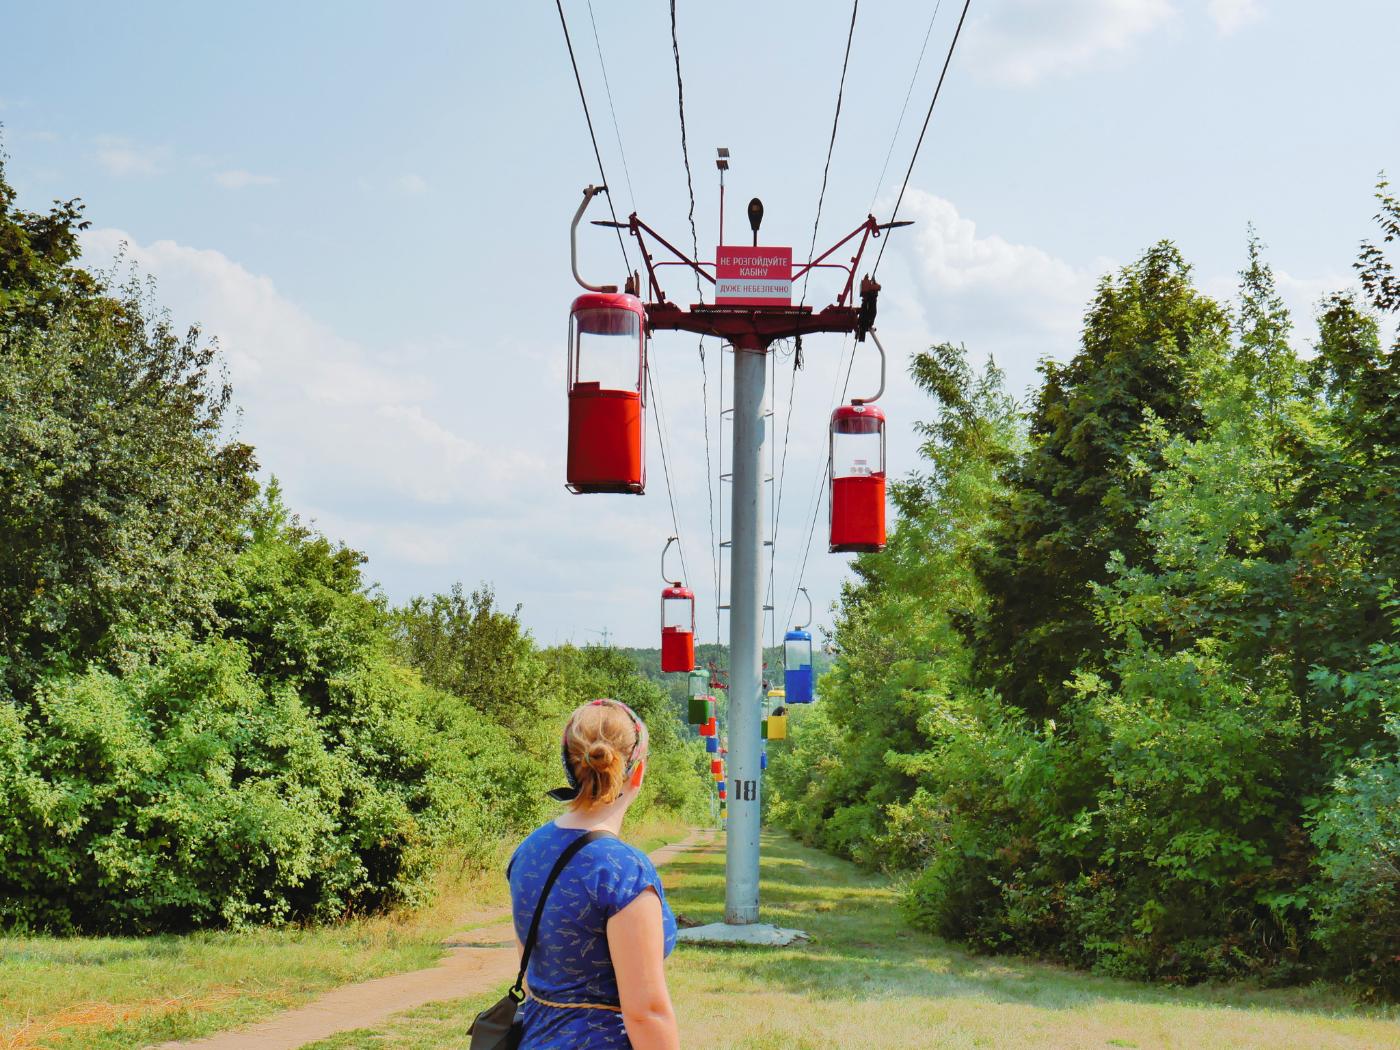 Kharkiv cable car eastern Ukraine city soviet era attraction gorky park primary colors safety